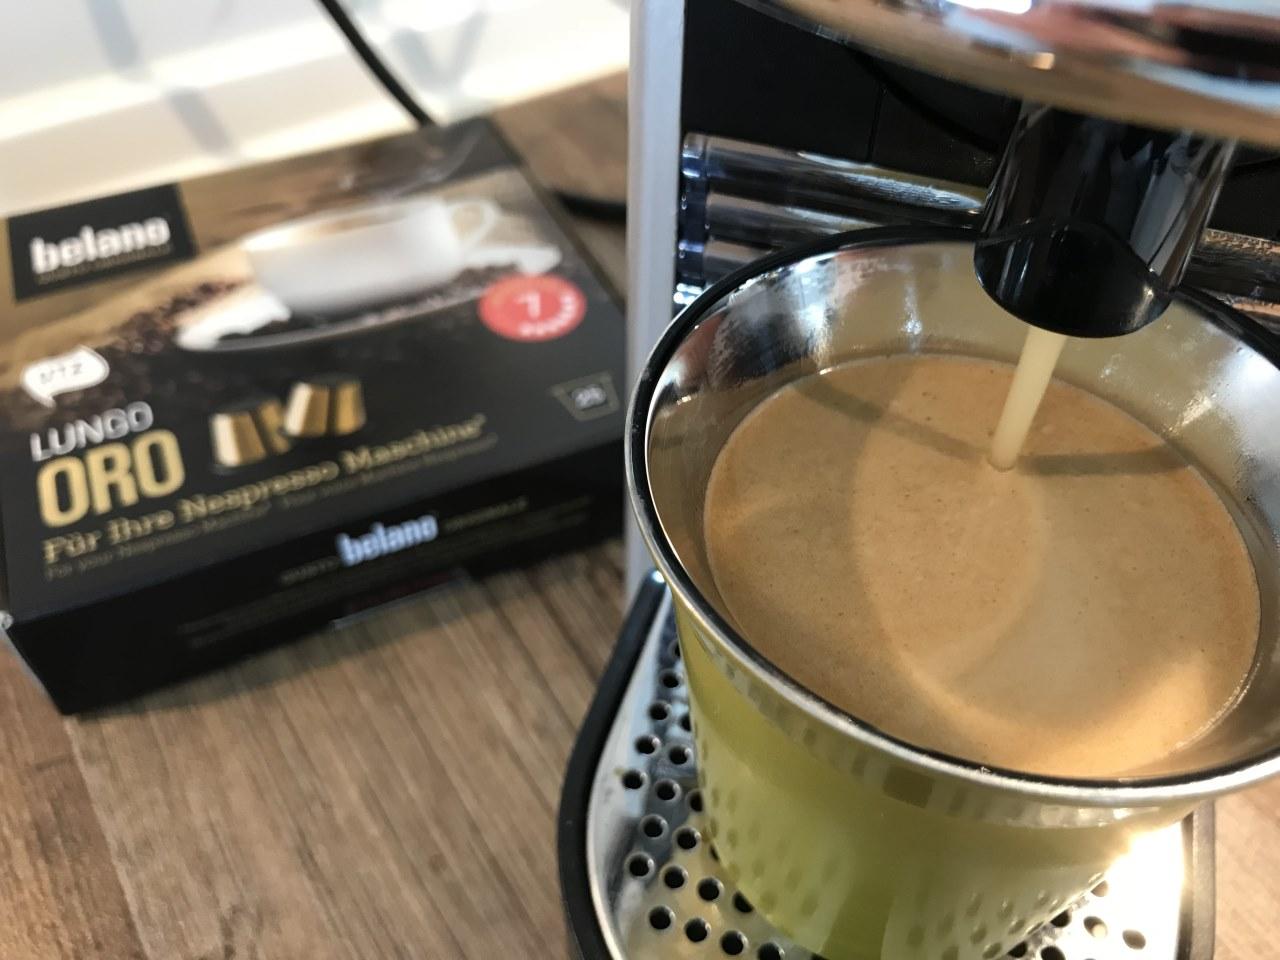 belano kaffeekapseln nespresso system maschine test. Black Bedroom Furniture Sets. Home Design Ideas